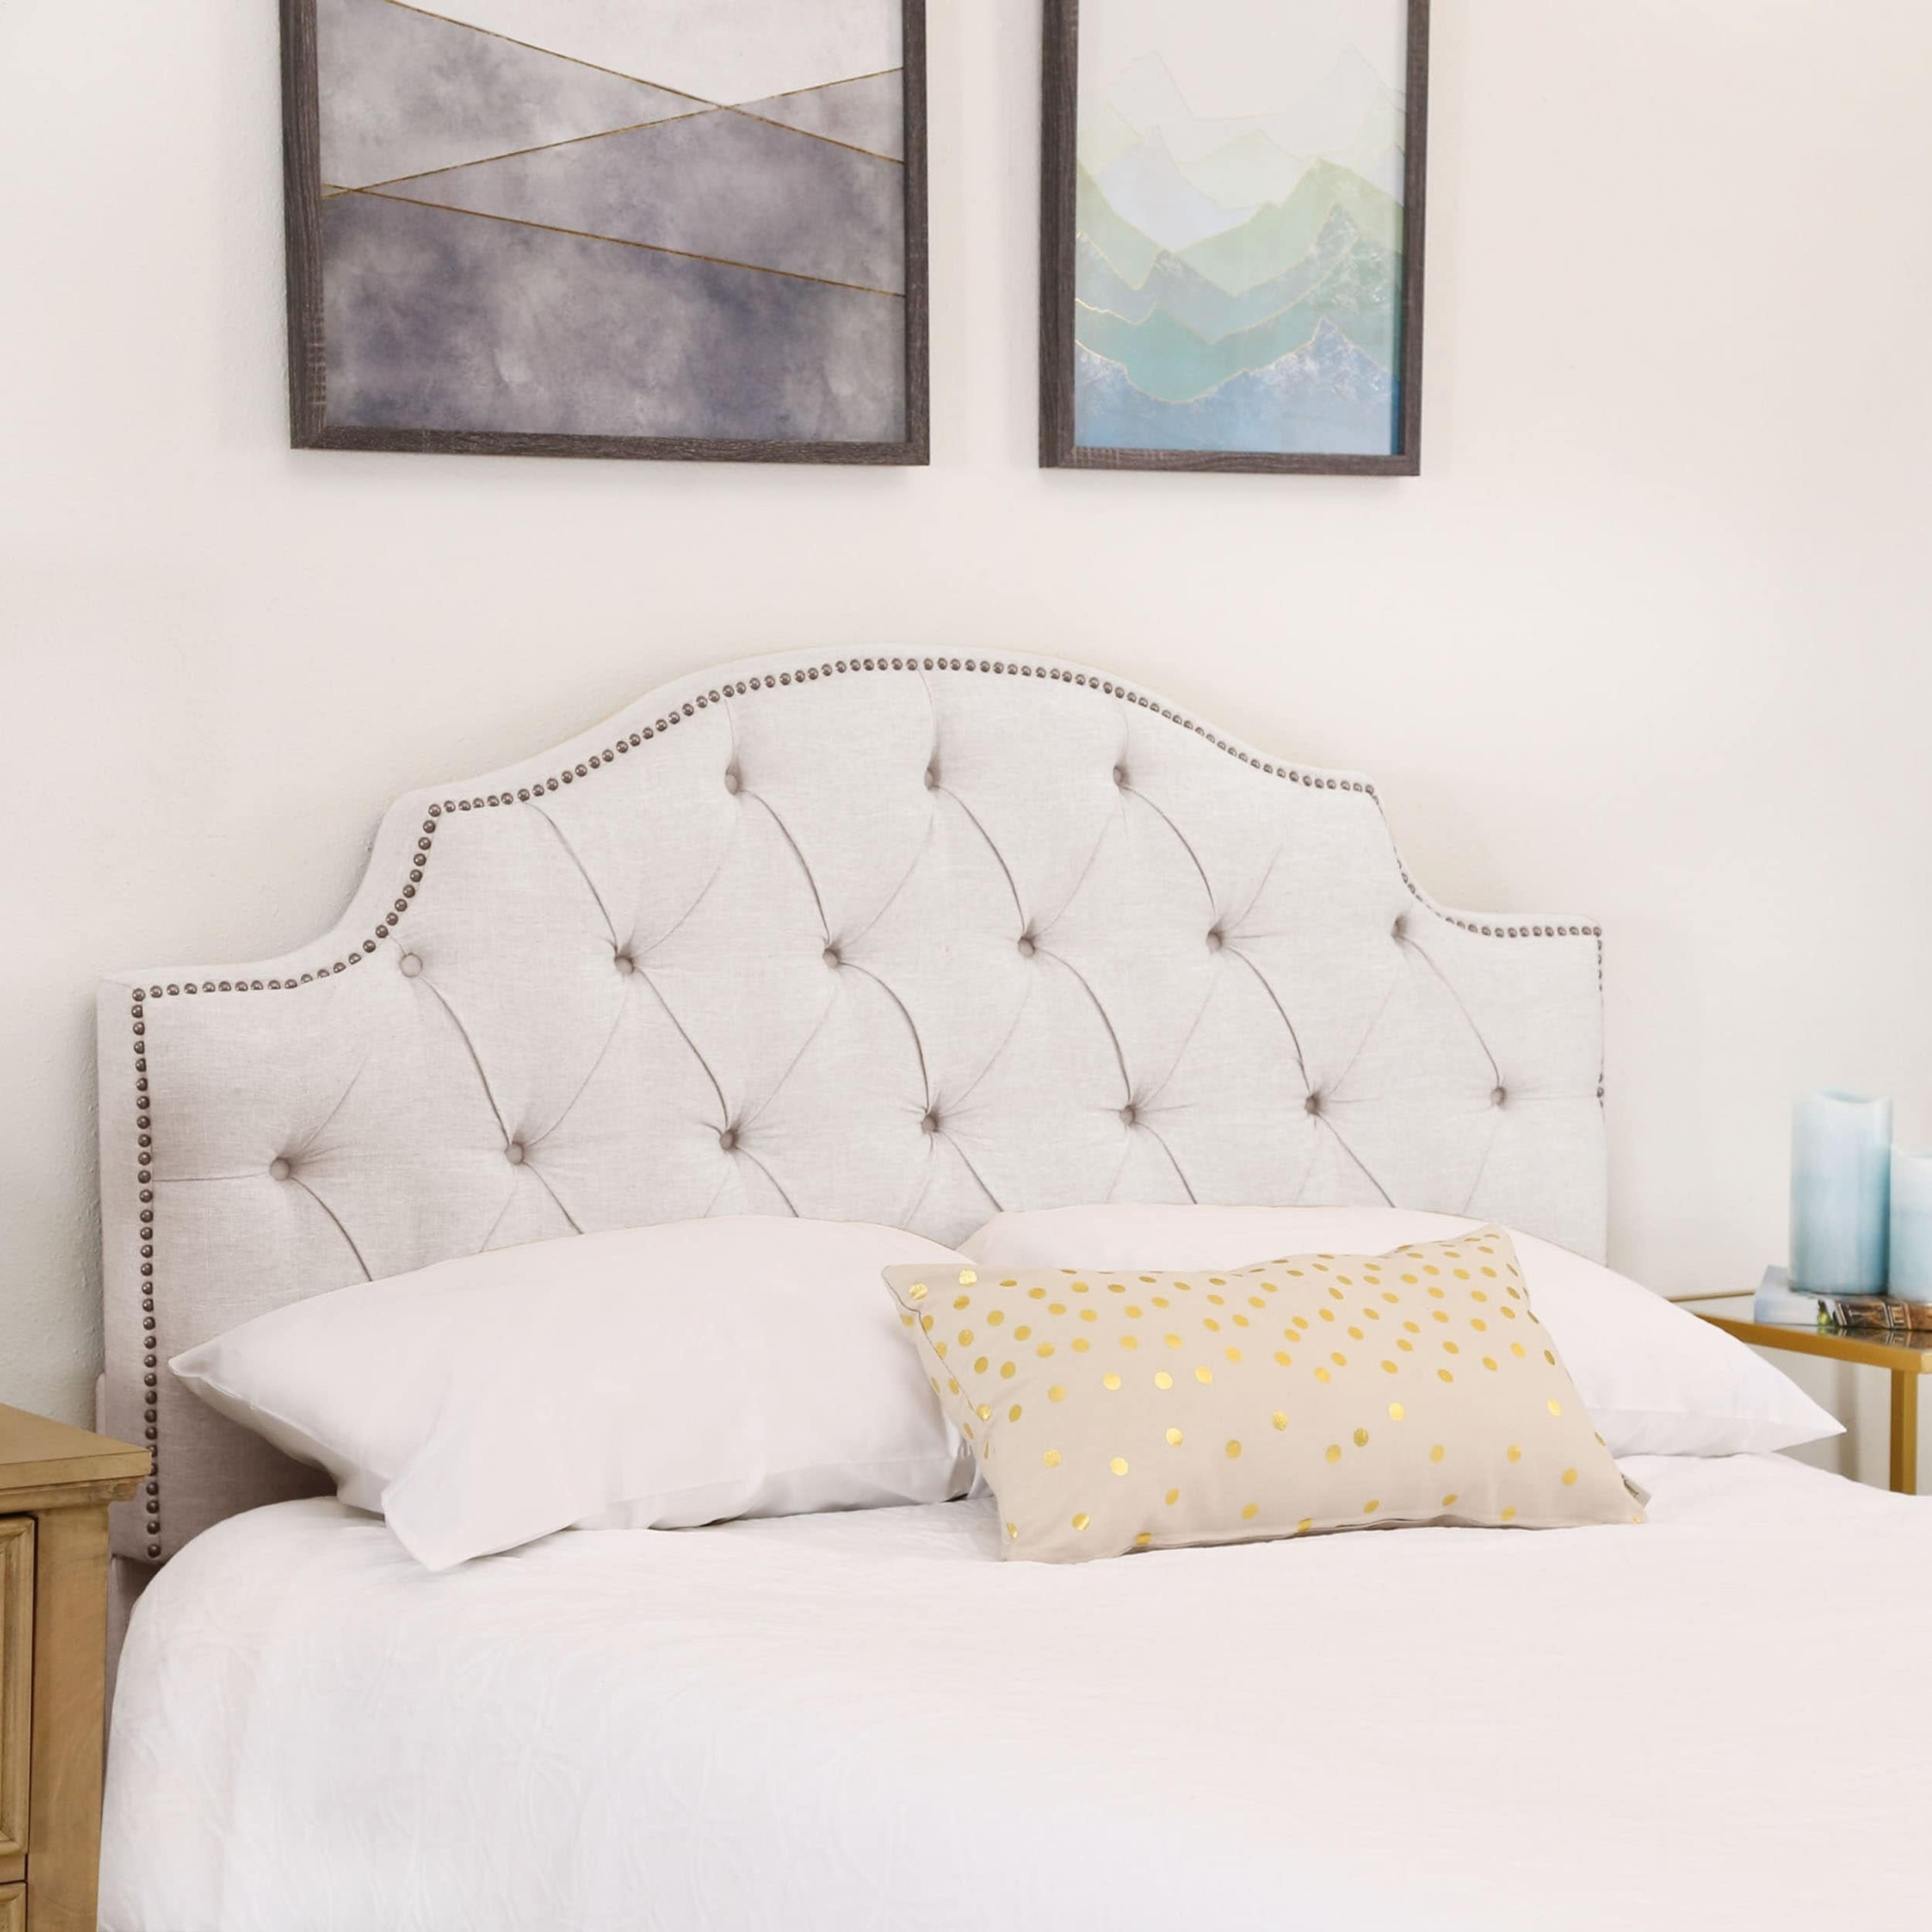 Abbyson Royal Tufted White Queen/ Full Linen Headboard (Q...